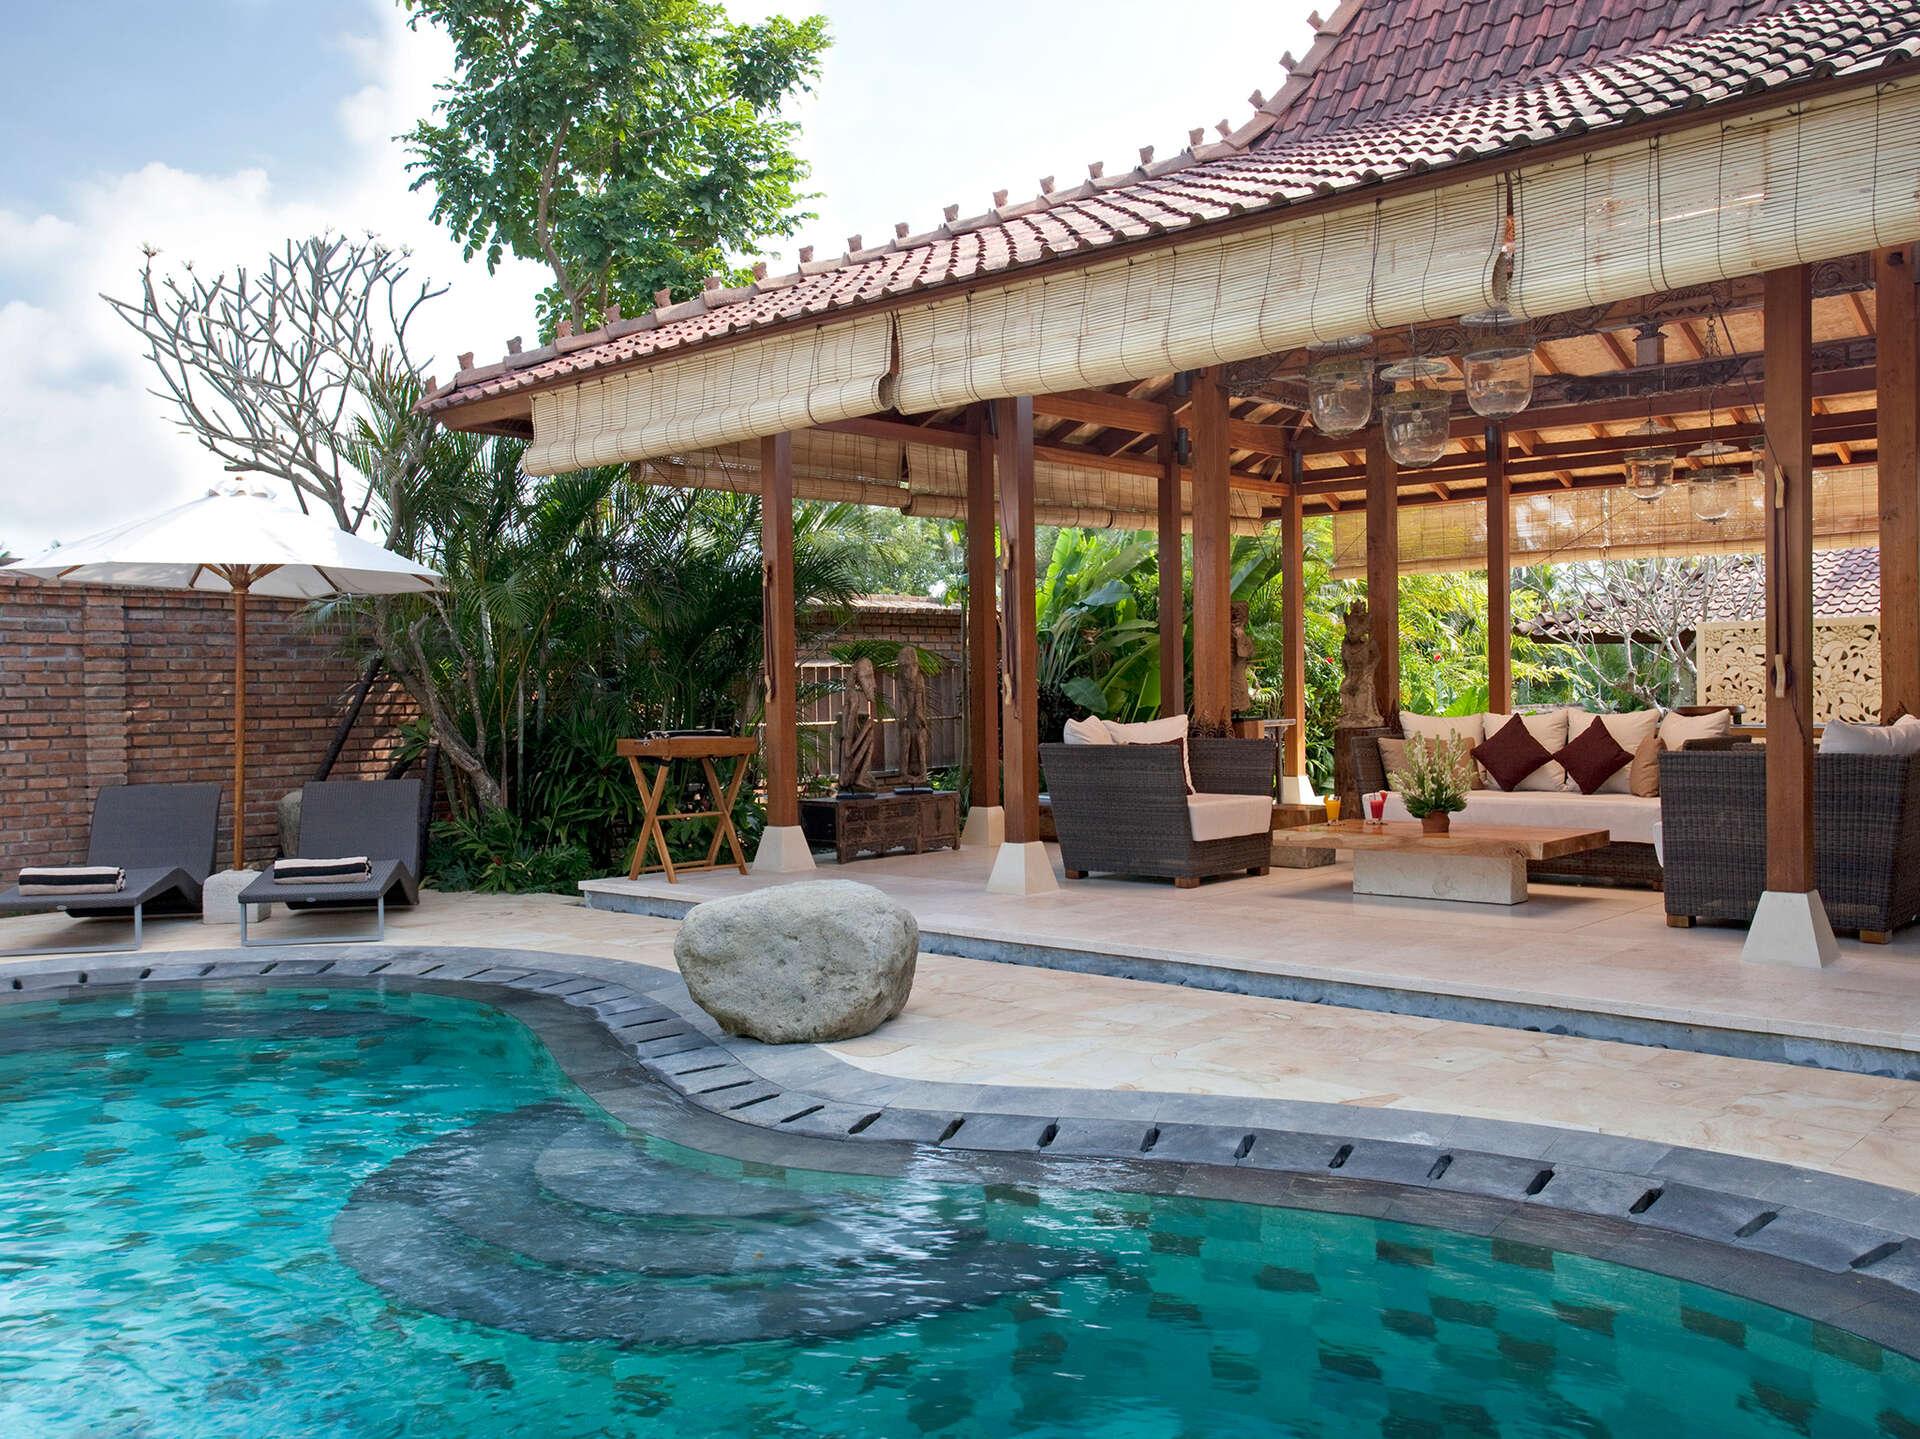 Luxury villa rentals asia - Indonesia - Bali - Canggu - Amy - Image 1/21